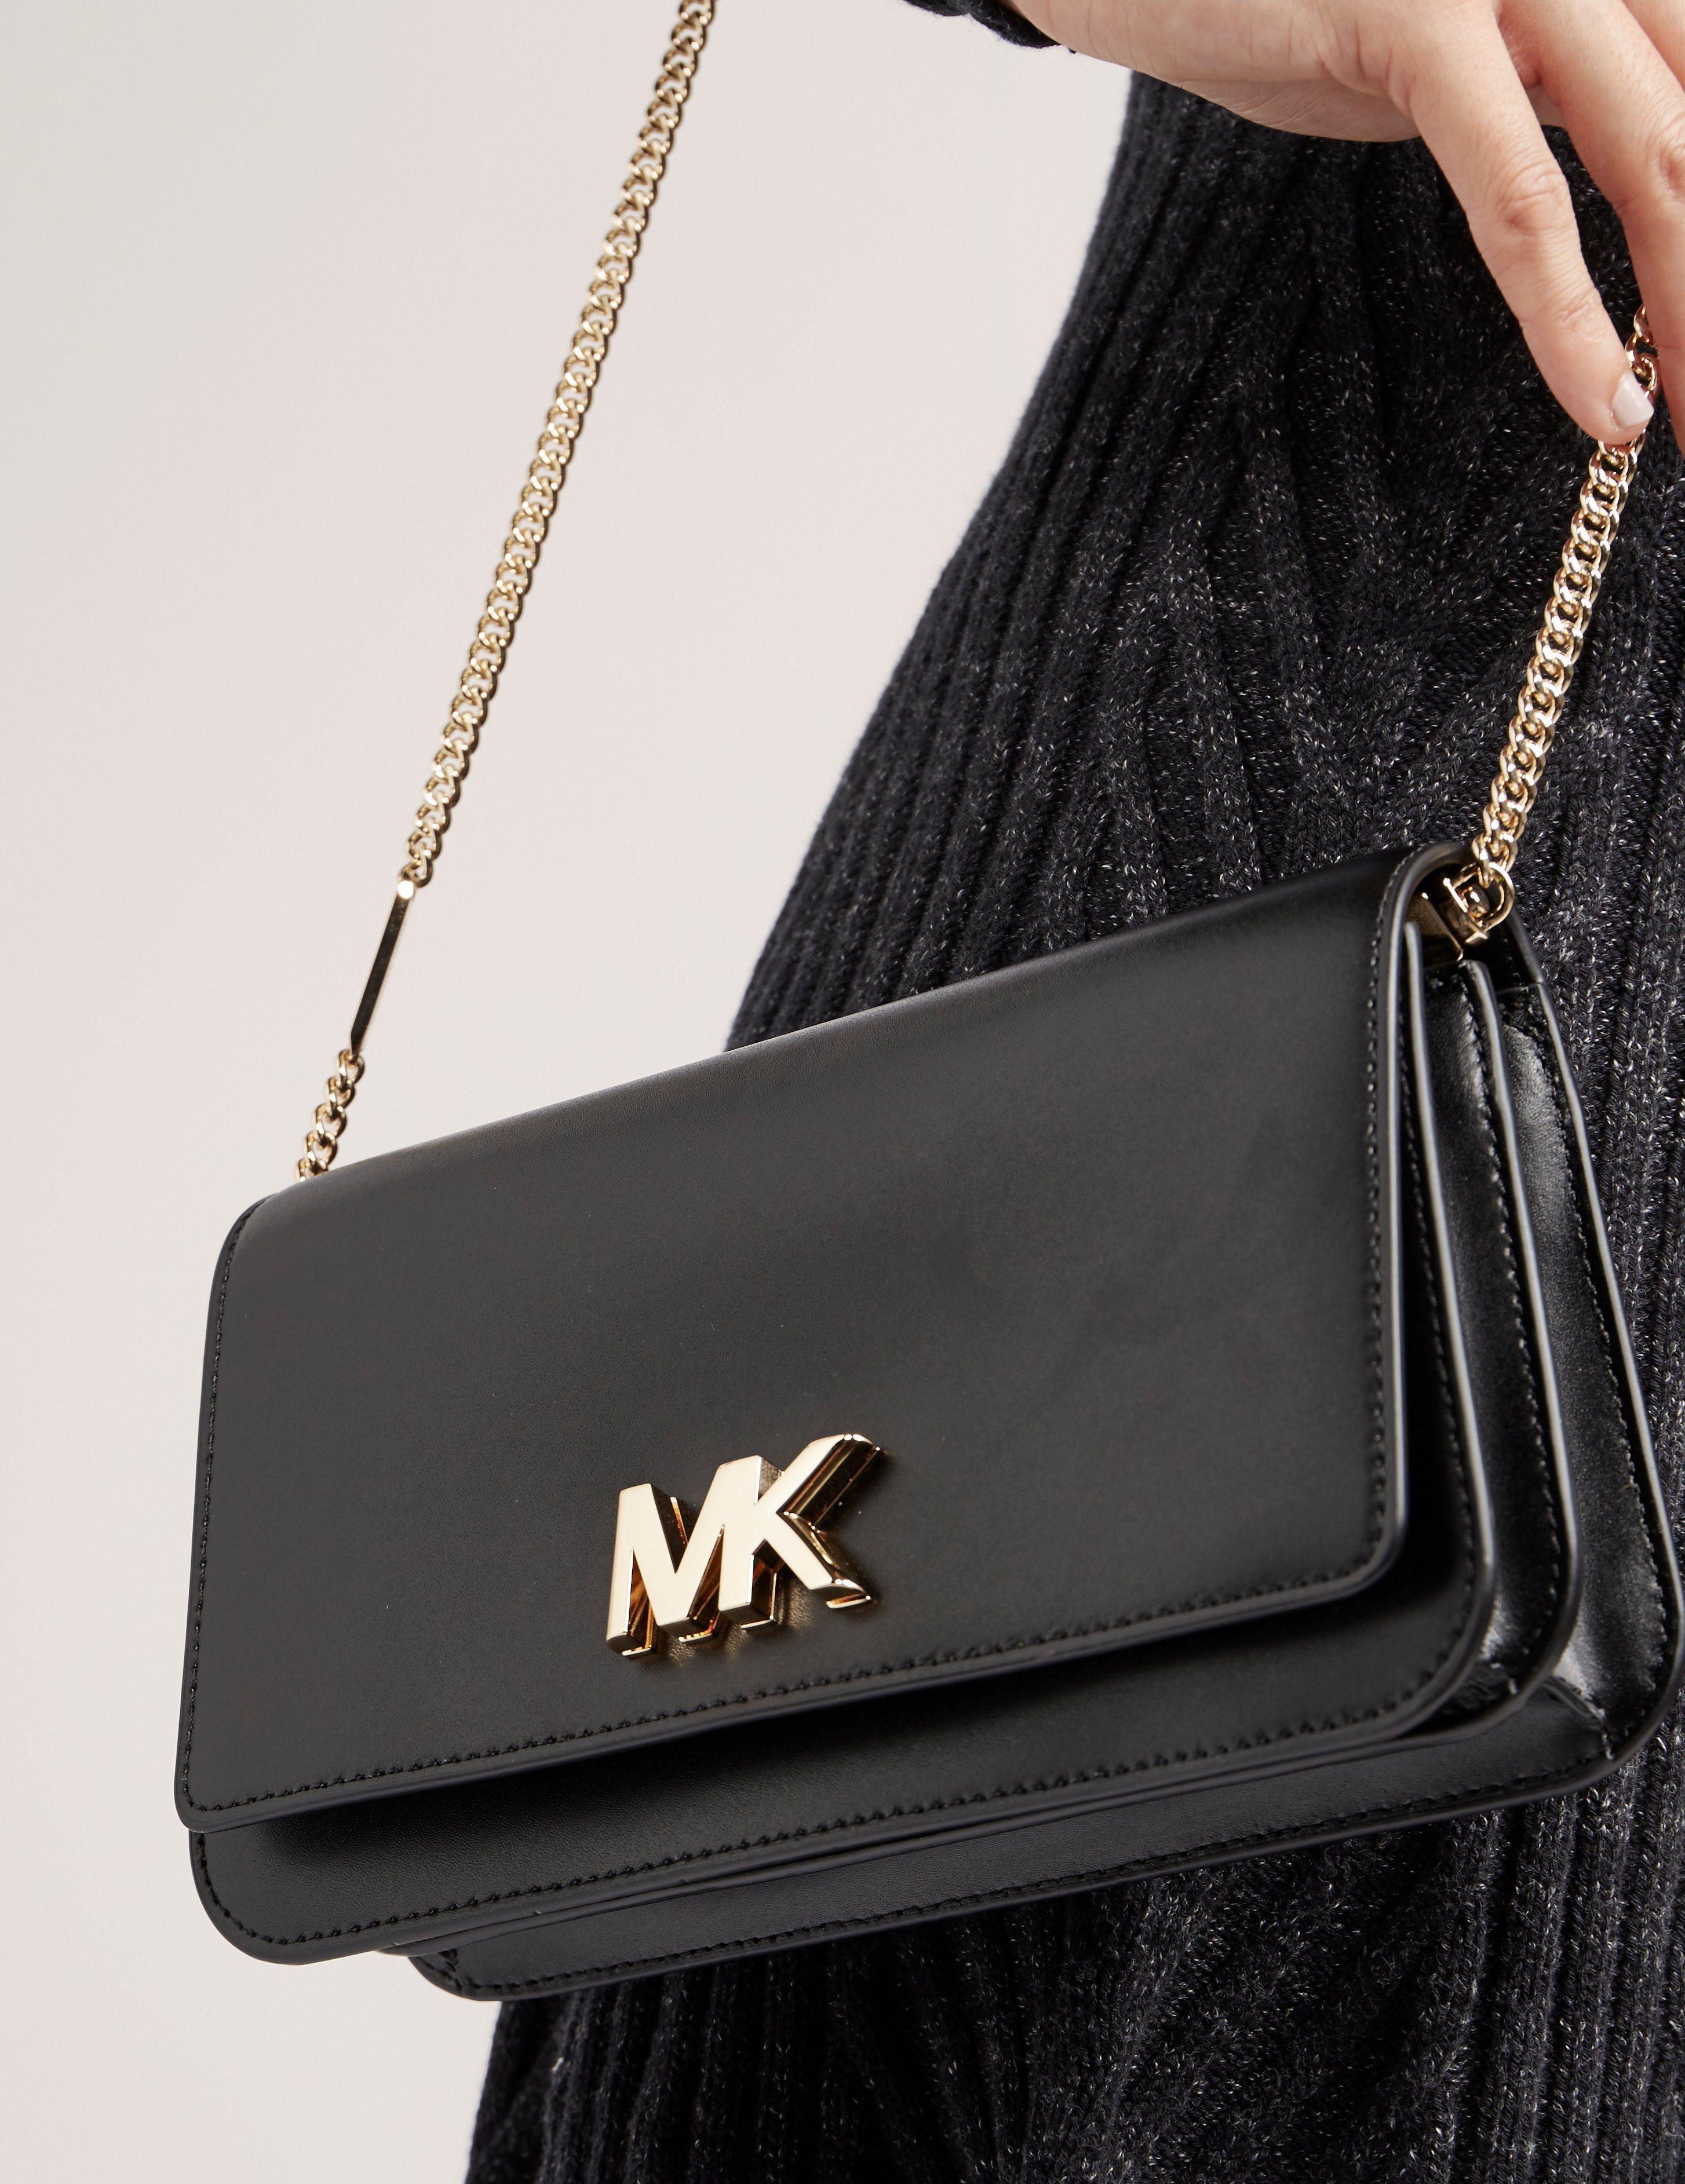 Michael Kors Black Mott clutch bag